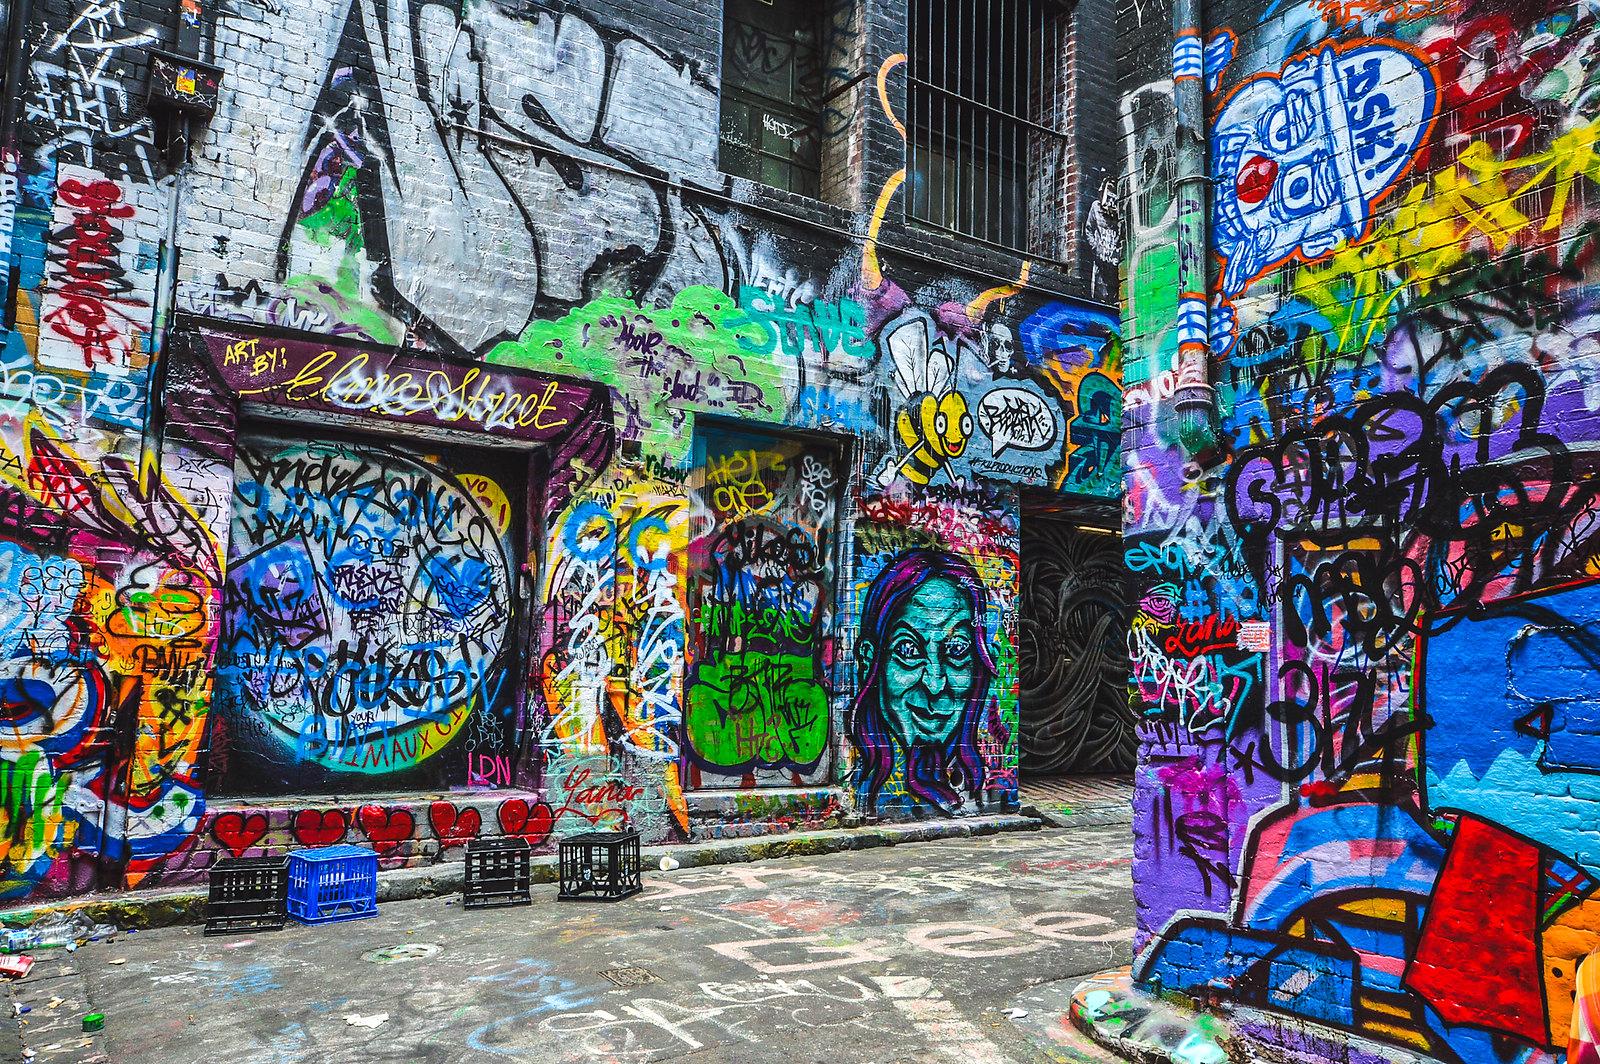 Melbourne Street Art 2015